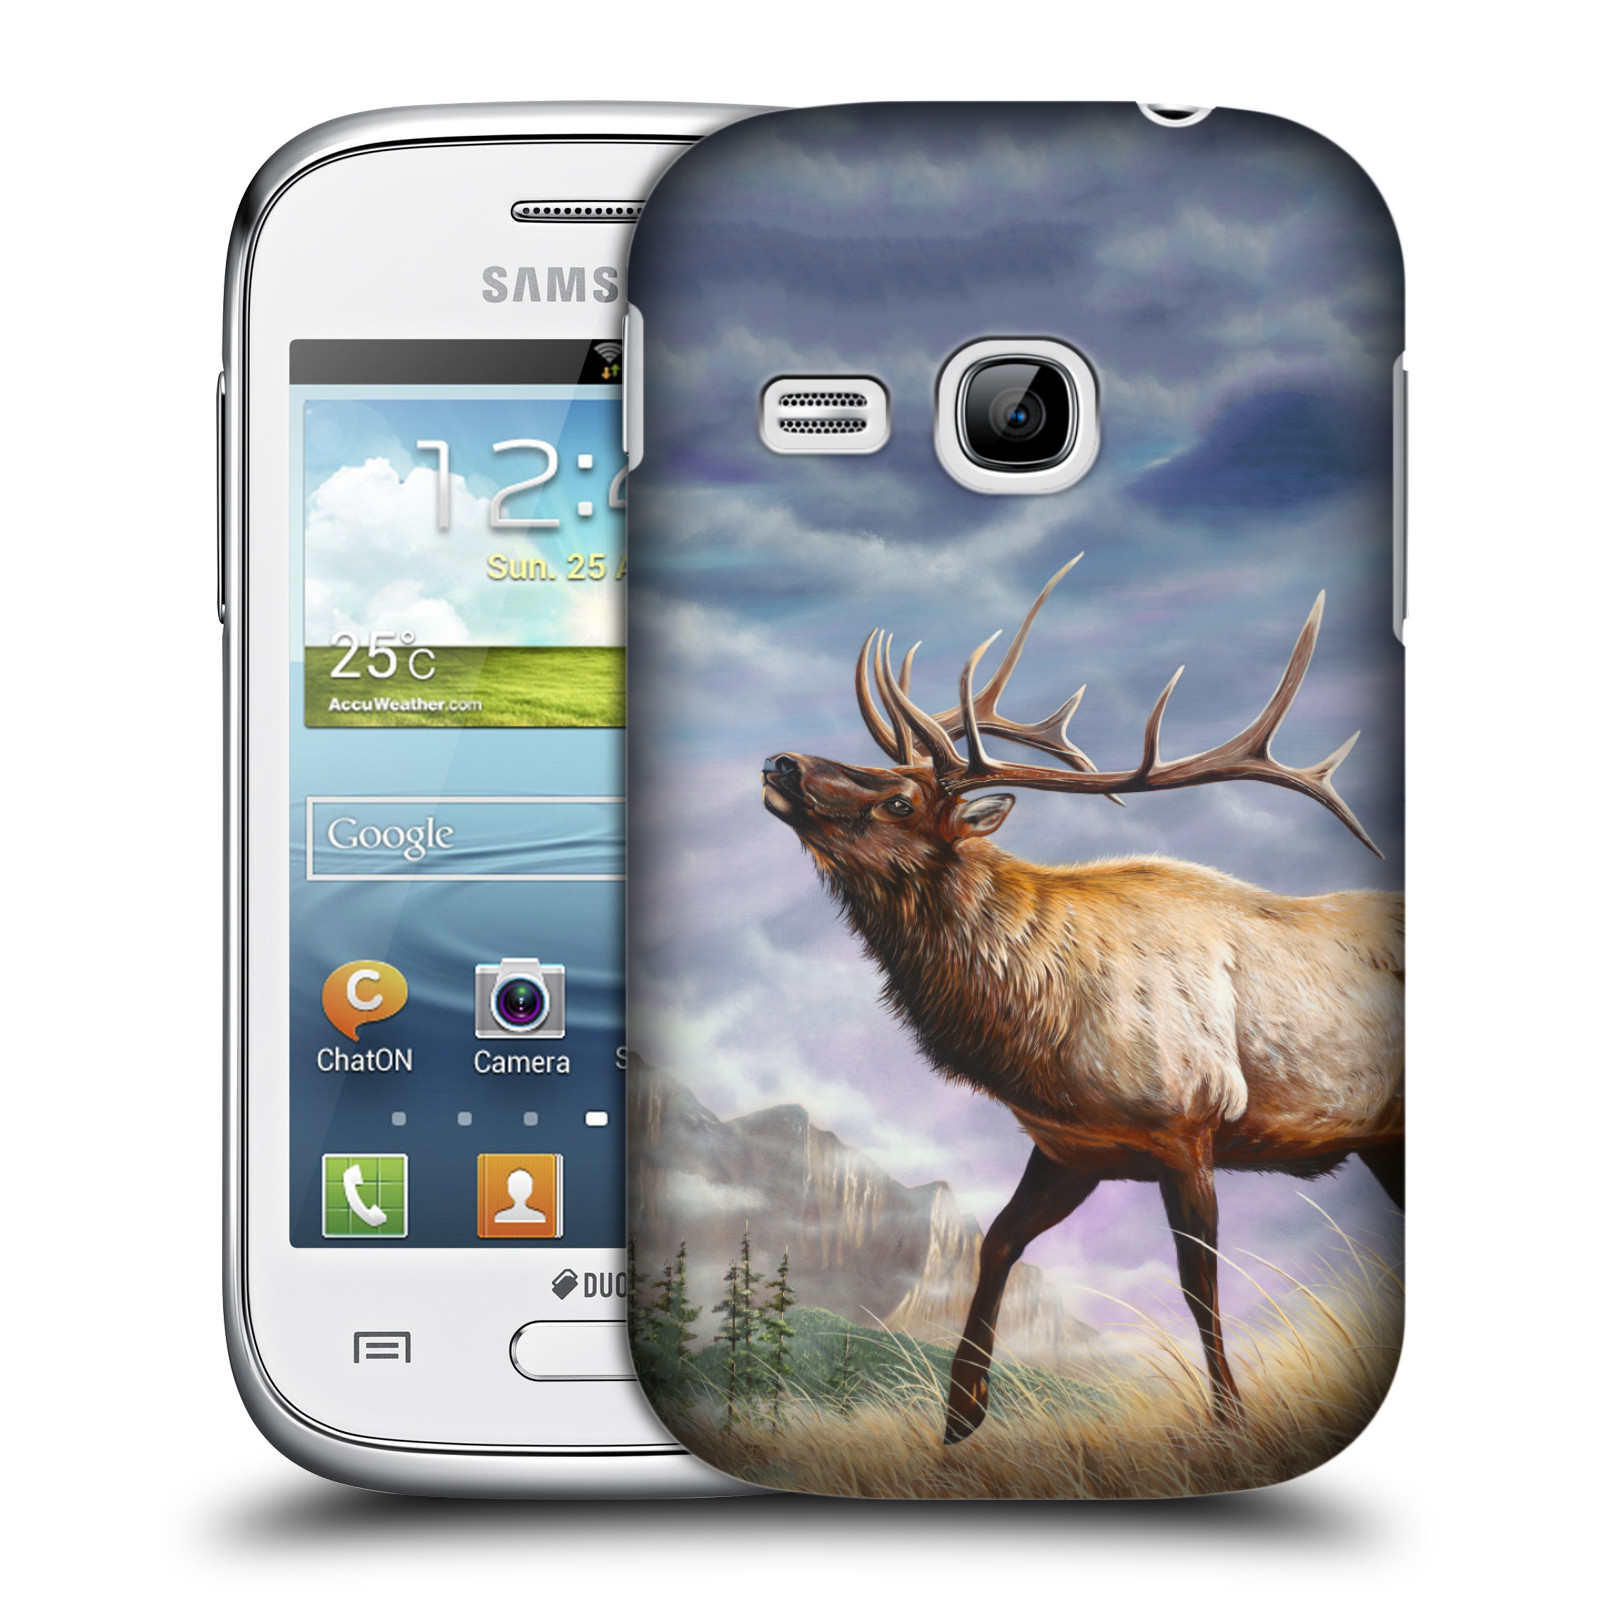 OFFICIAL-GENO-PEOPLES-ART-LIFE-HARD-BACK-CASE-FOR-SAMSUNG-PHONES-5